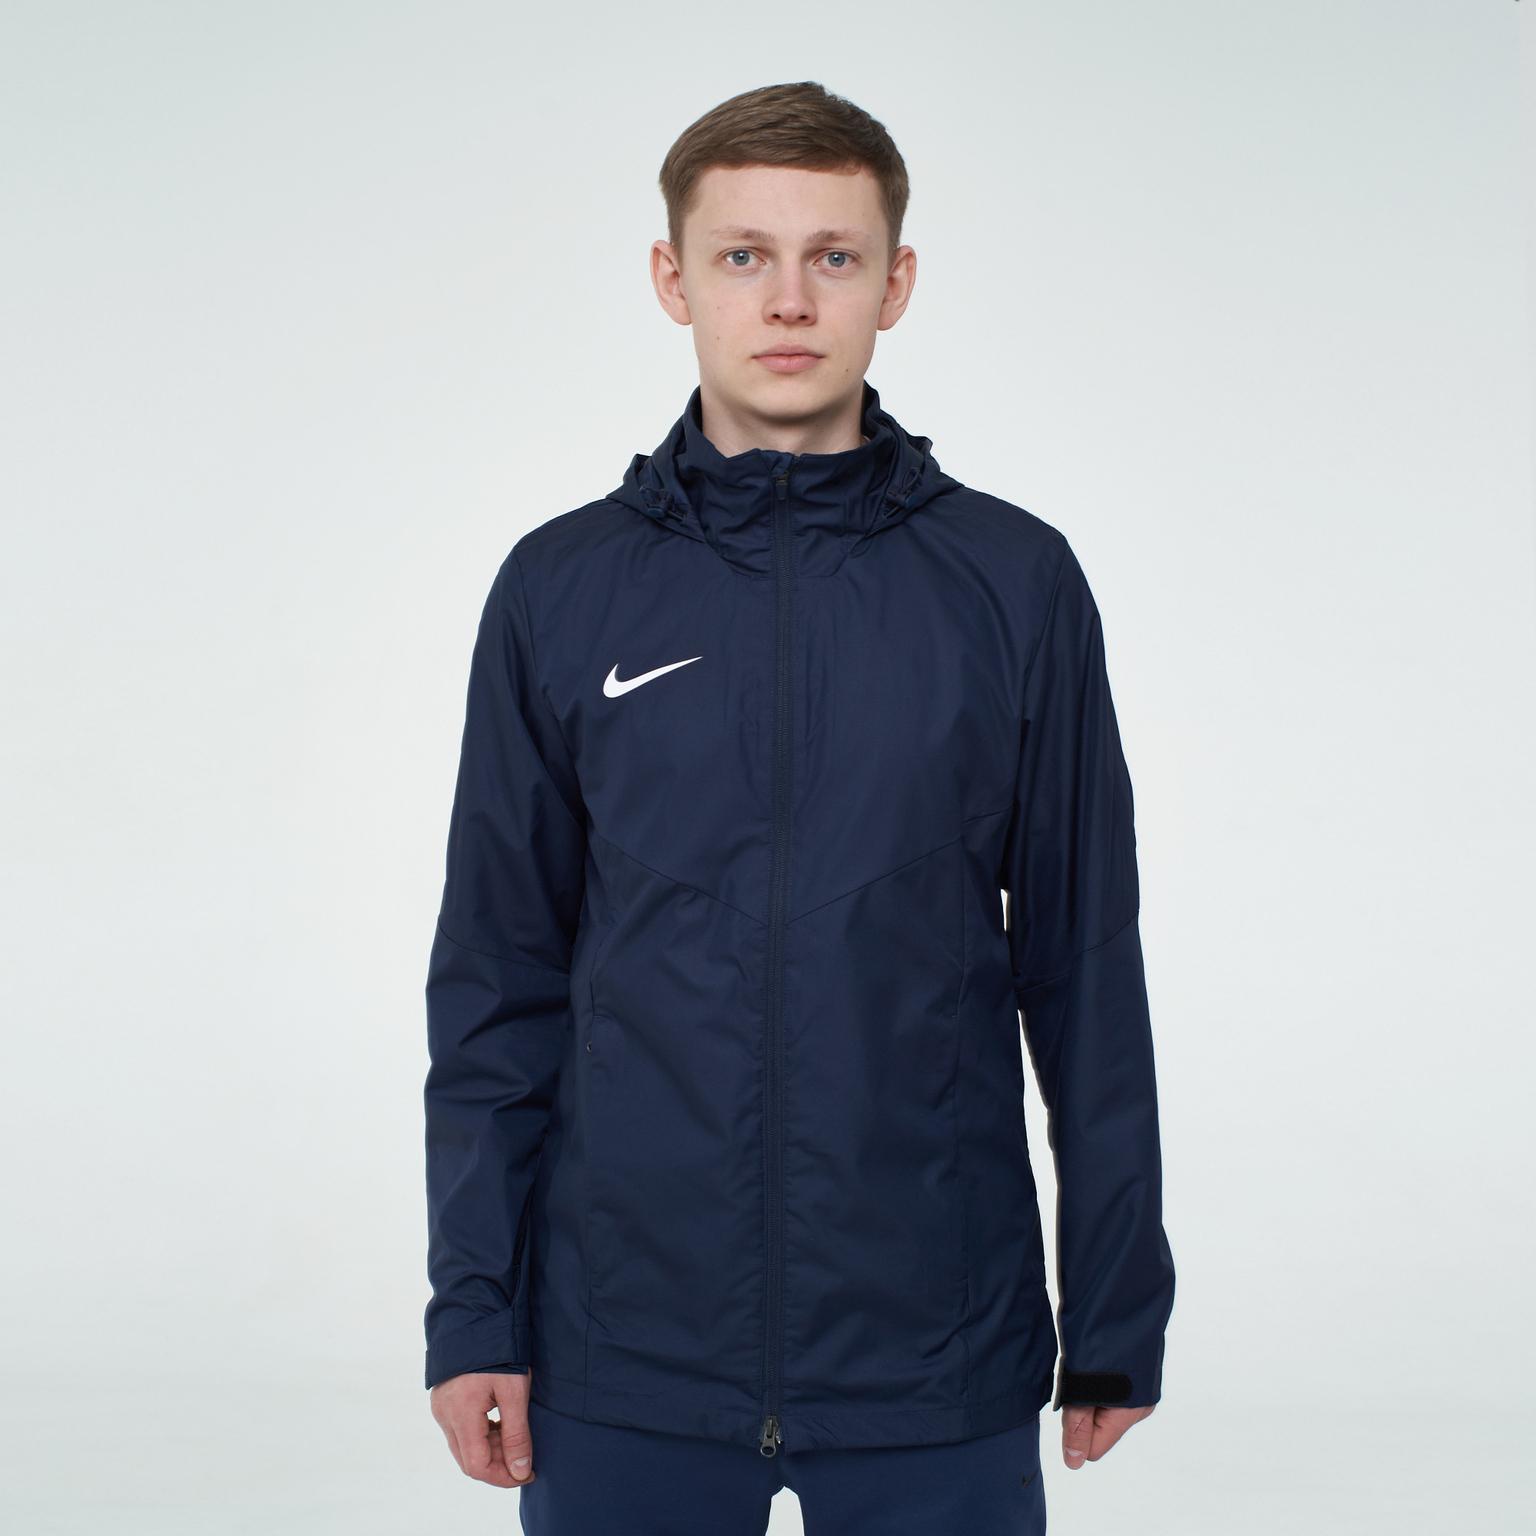 Куртка Nike Academy 18 Rain Jacket 893796-451 цена